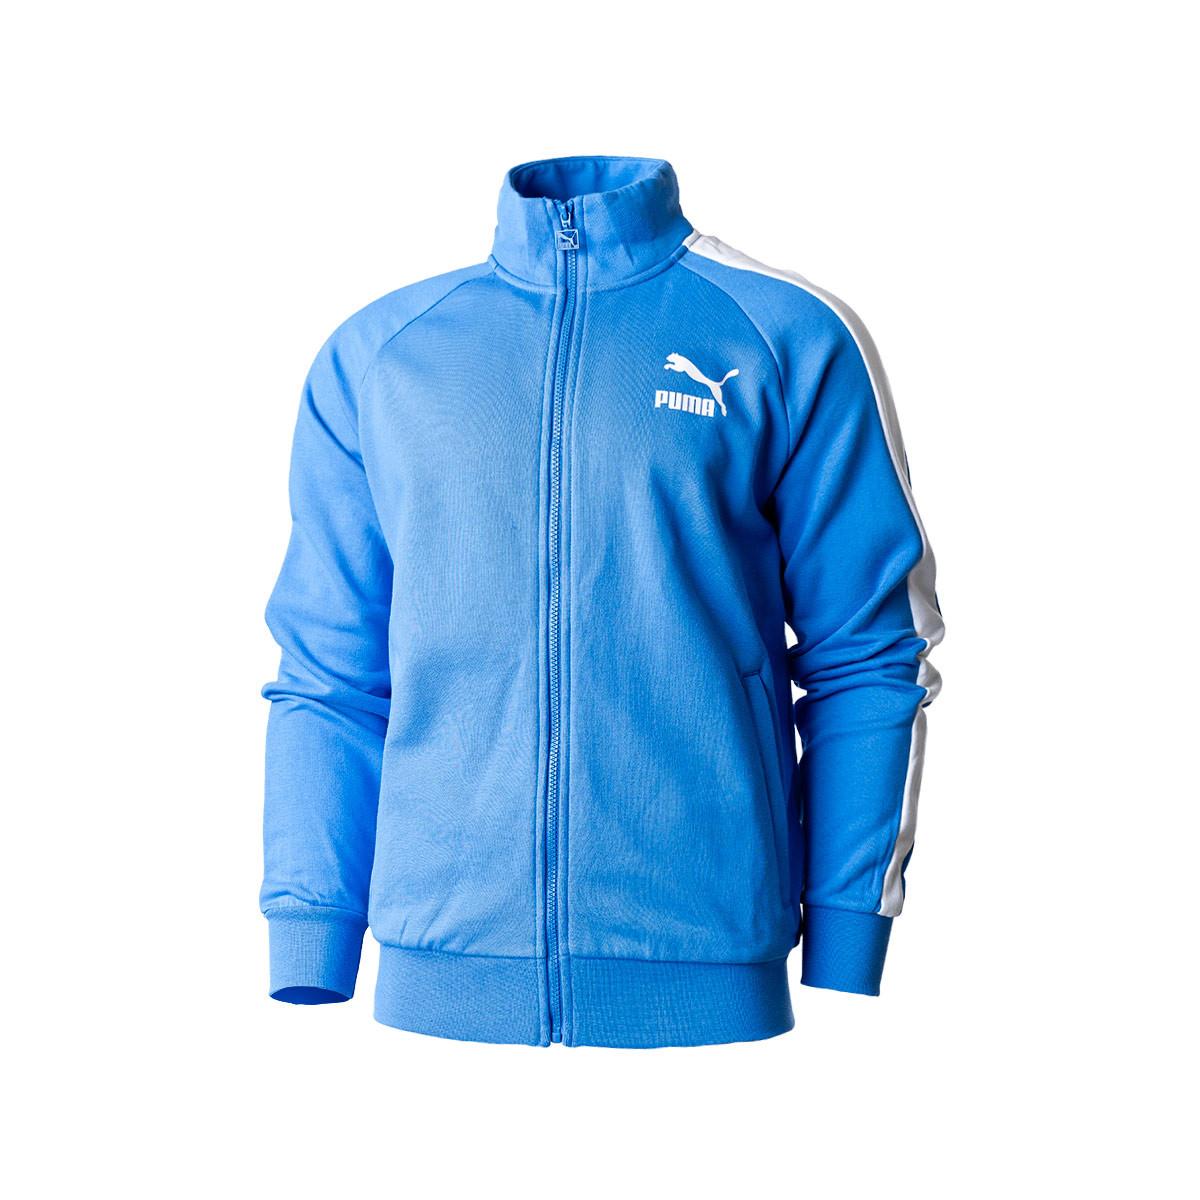 Serpiente Meandro Fusión  Jacket Puma Iconic T7 Track Jacket TR Palace Blue - Football store Fútbol  Emotion